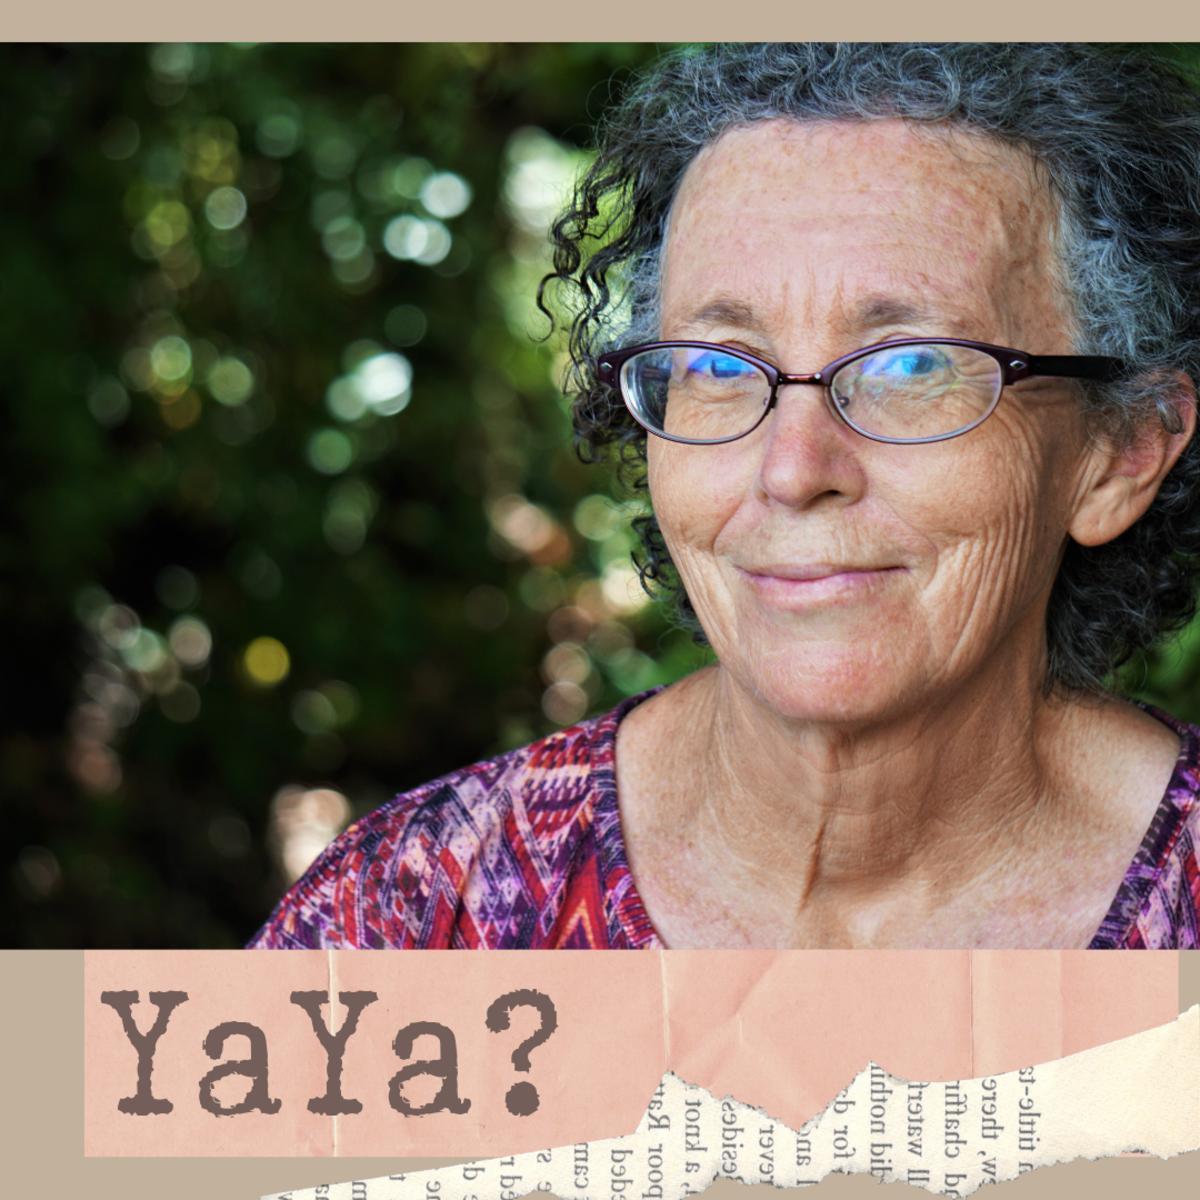 Are you a YaYa?